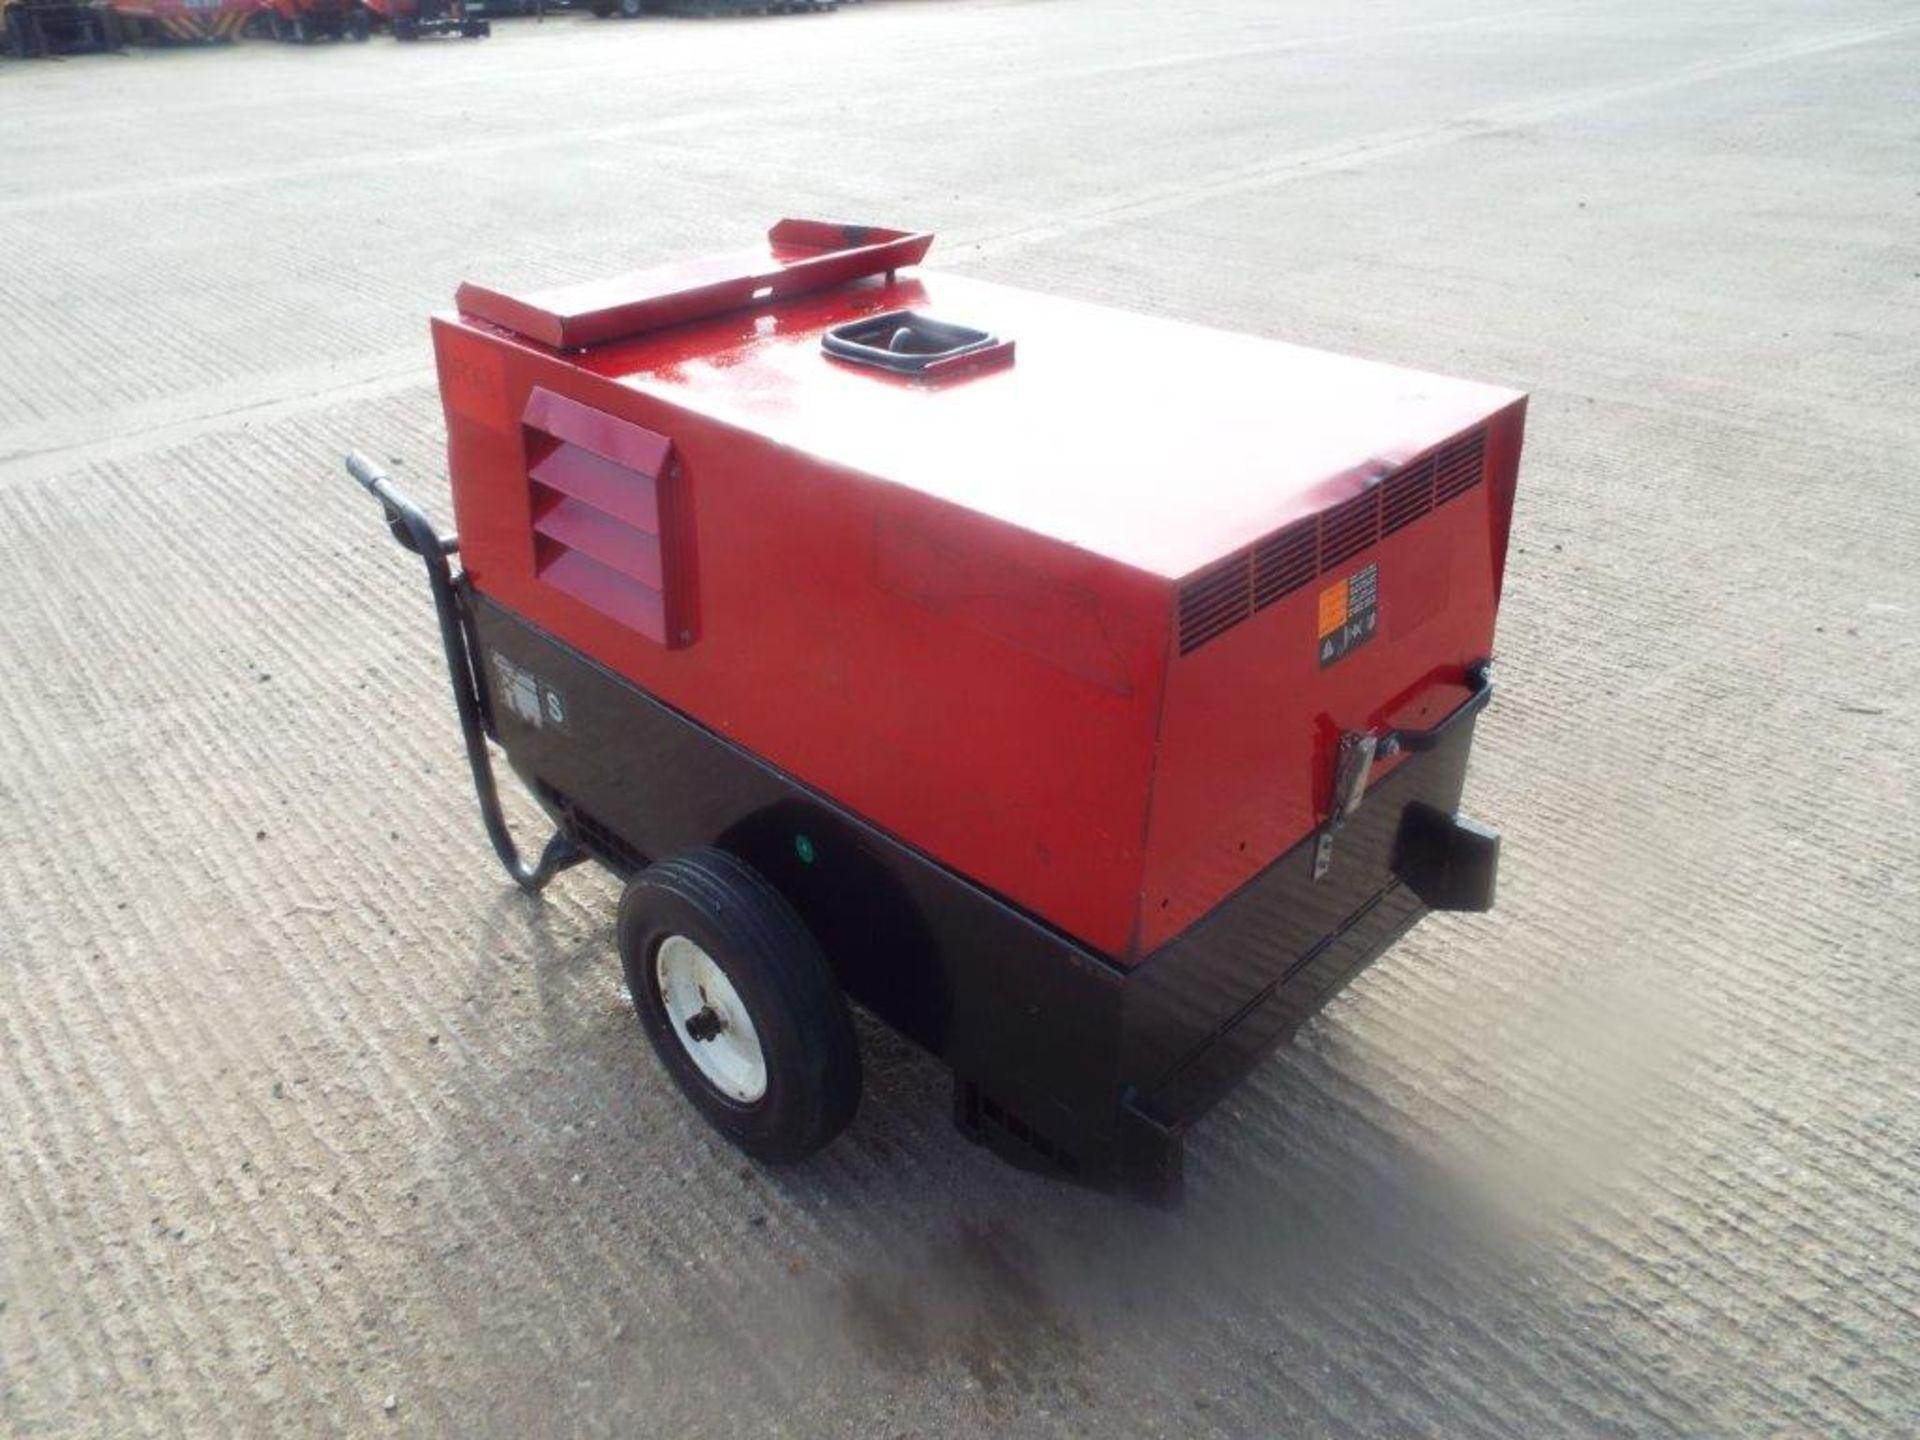 Lotto 21283 - 2012 Mosa T600SXC Diesel Welder Generator